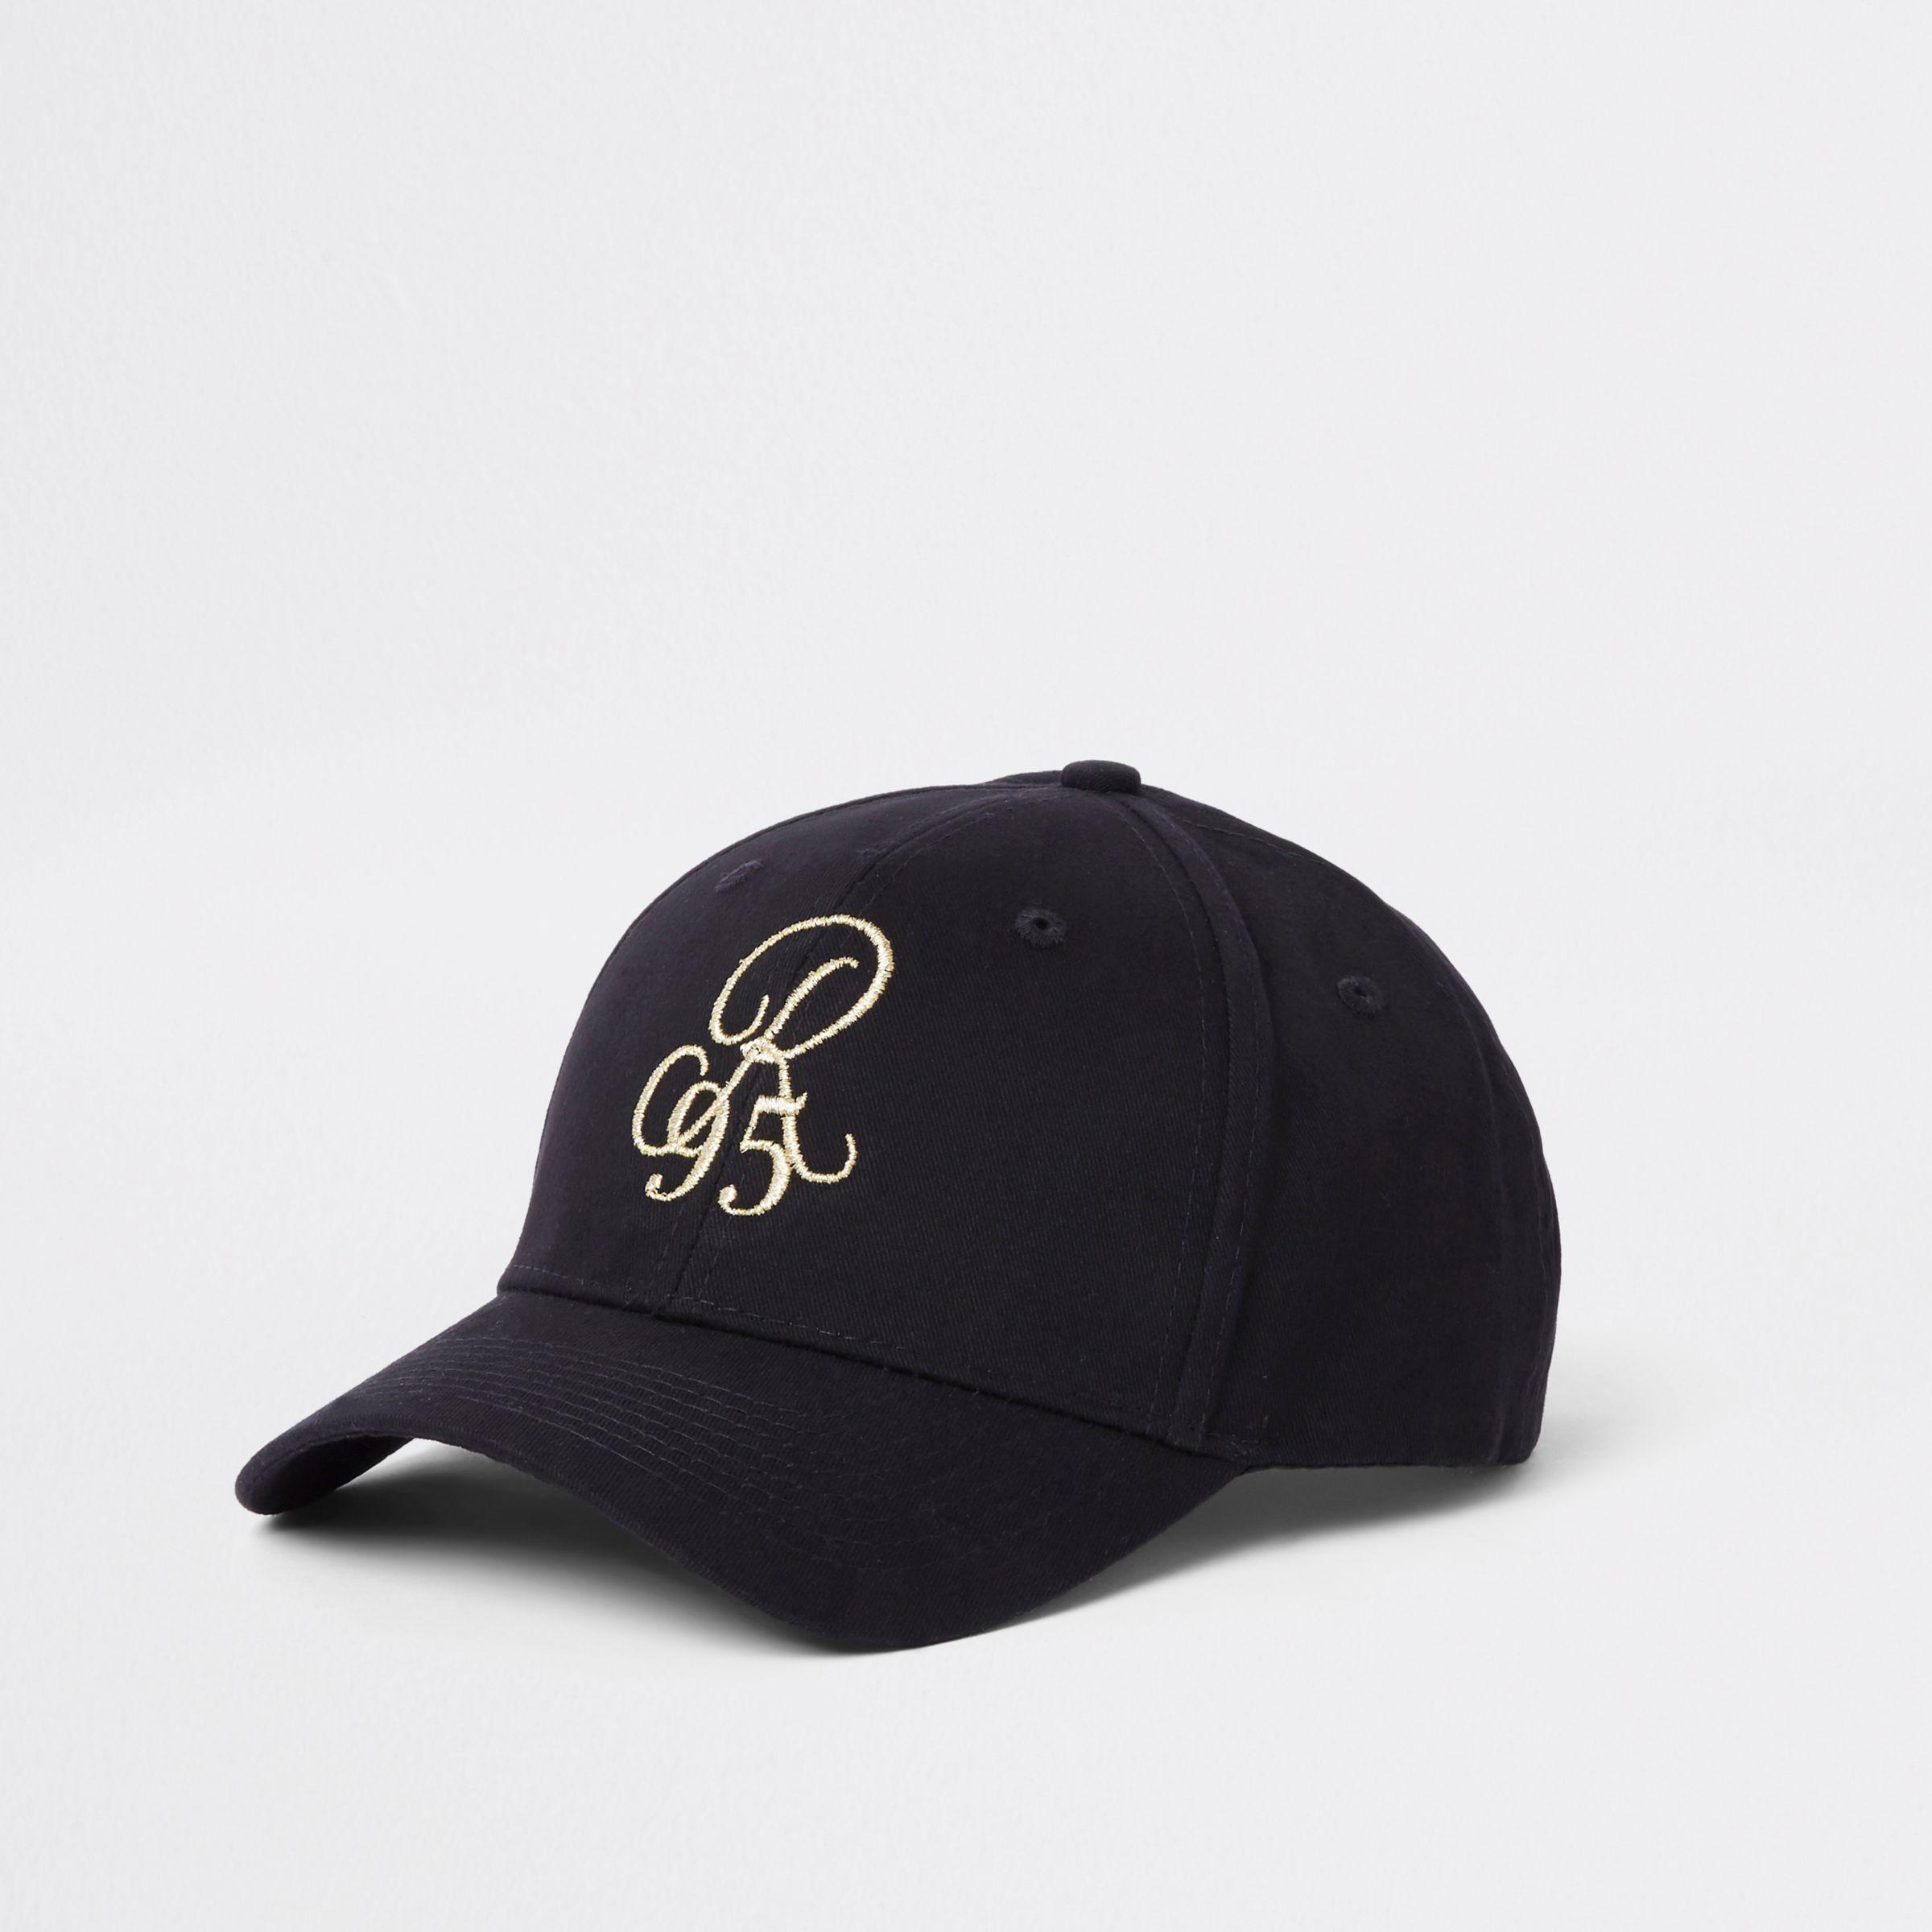 a858eddb60c Lyst - River Island Black  r95  Baseball Cap in Black for Men